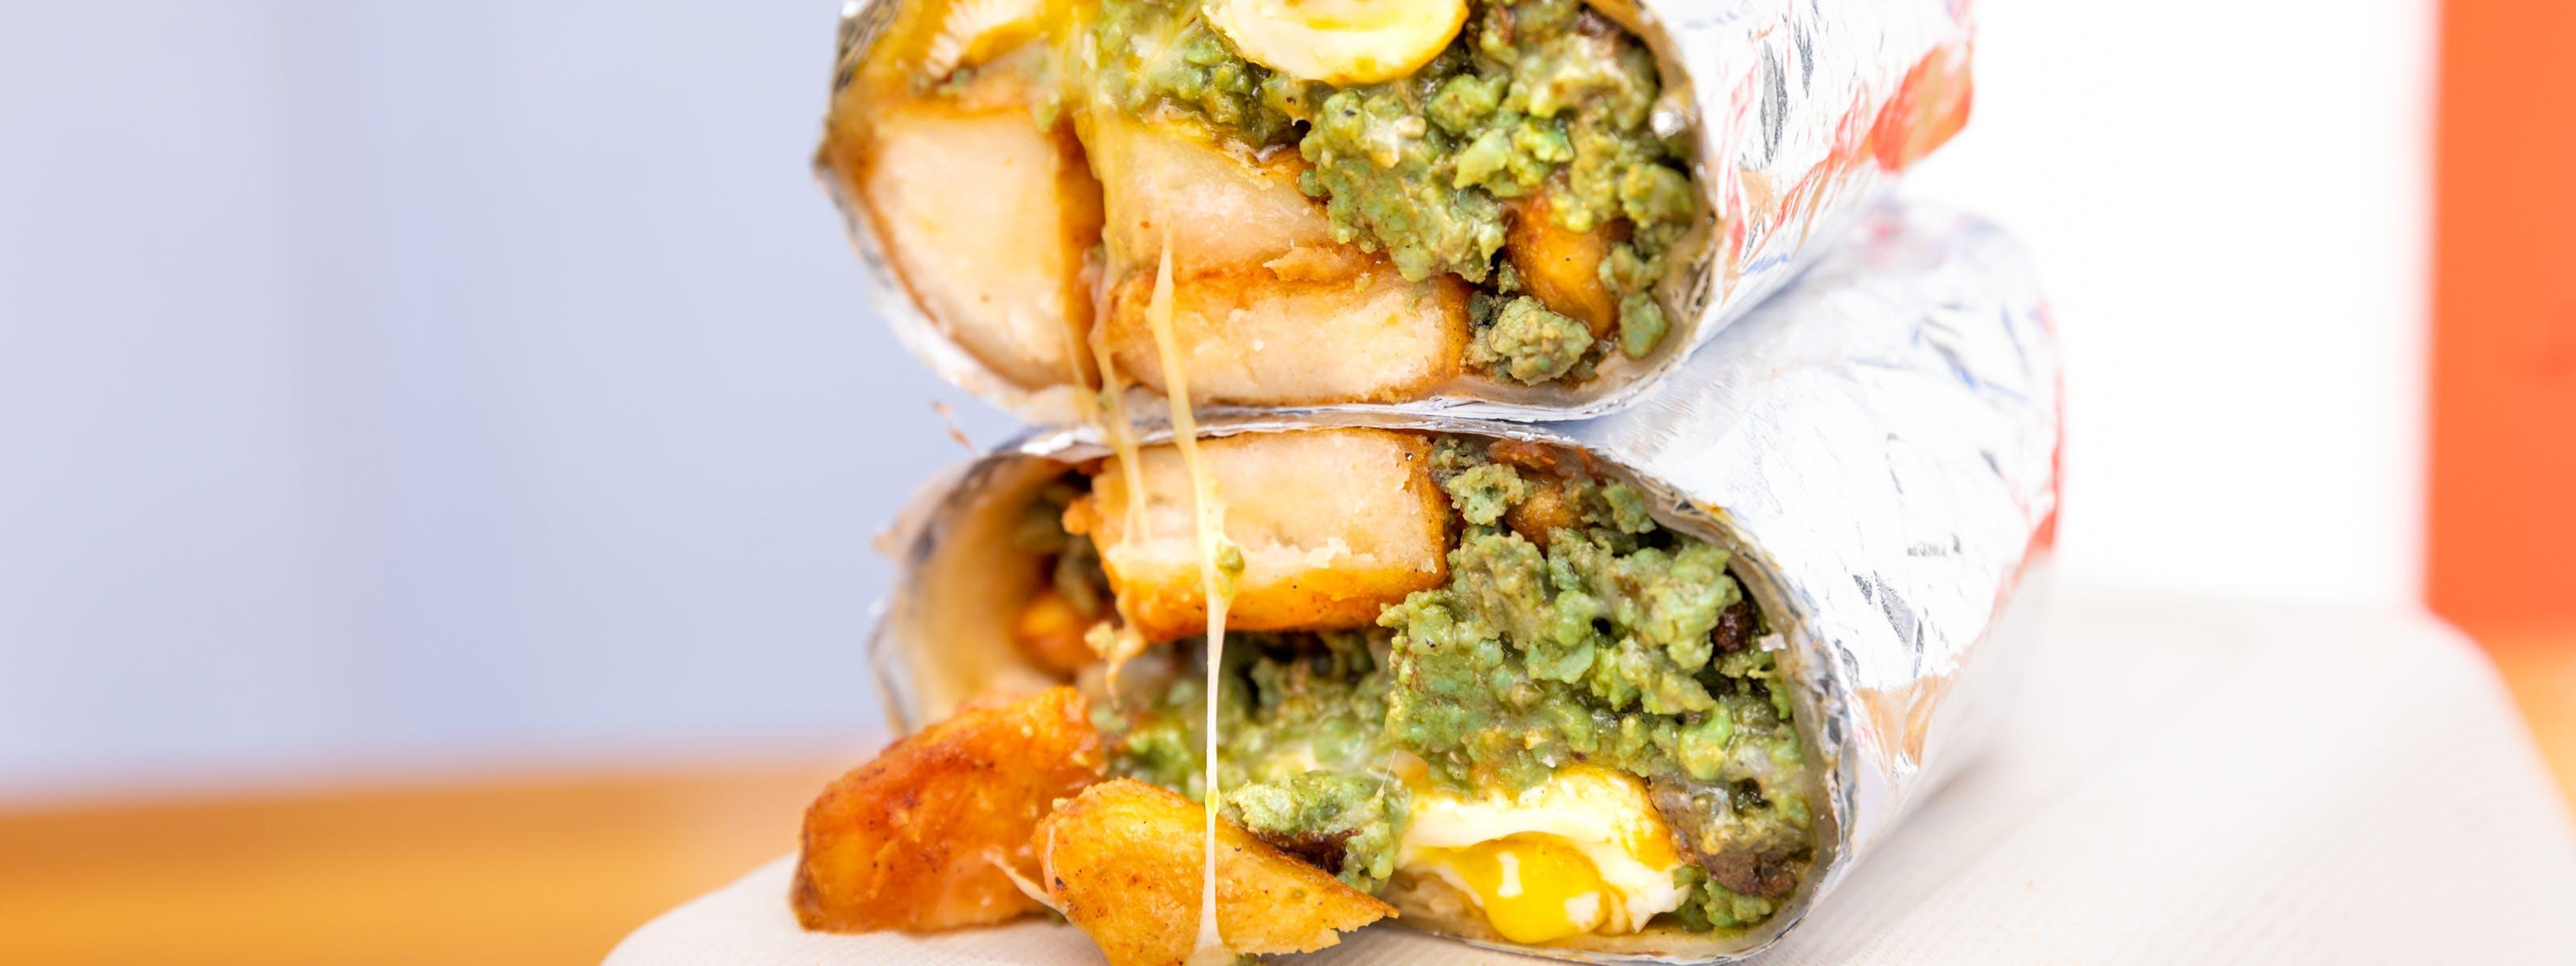 Infatuation Editorial Lead Brant Cox's 5 Favorite LA Restaurants Right now - Los Angeles - The Infatuation